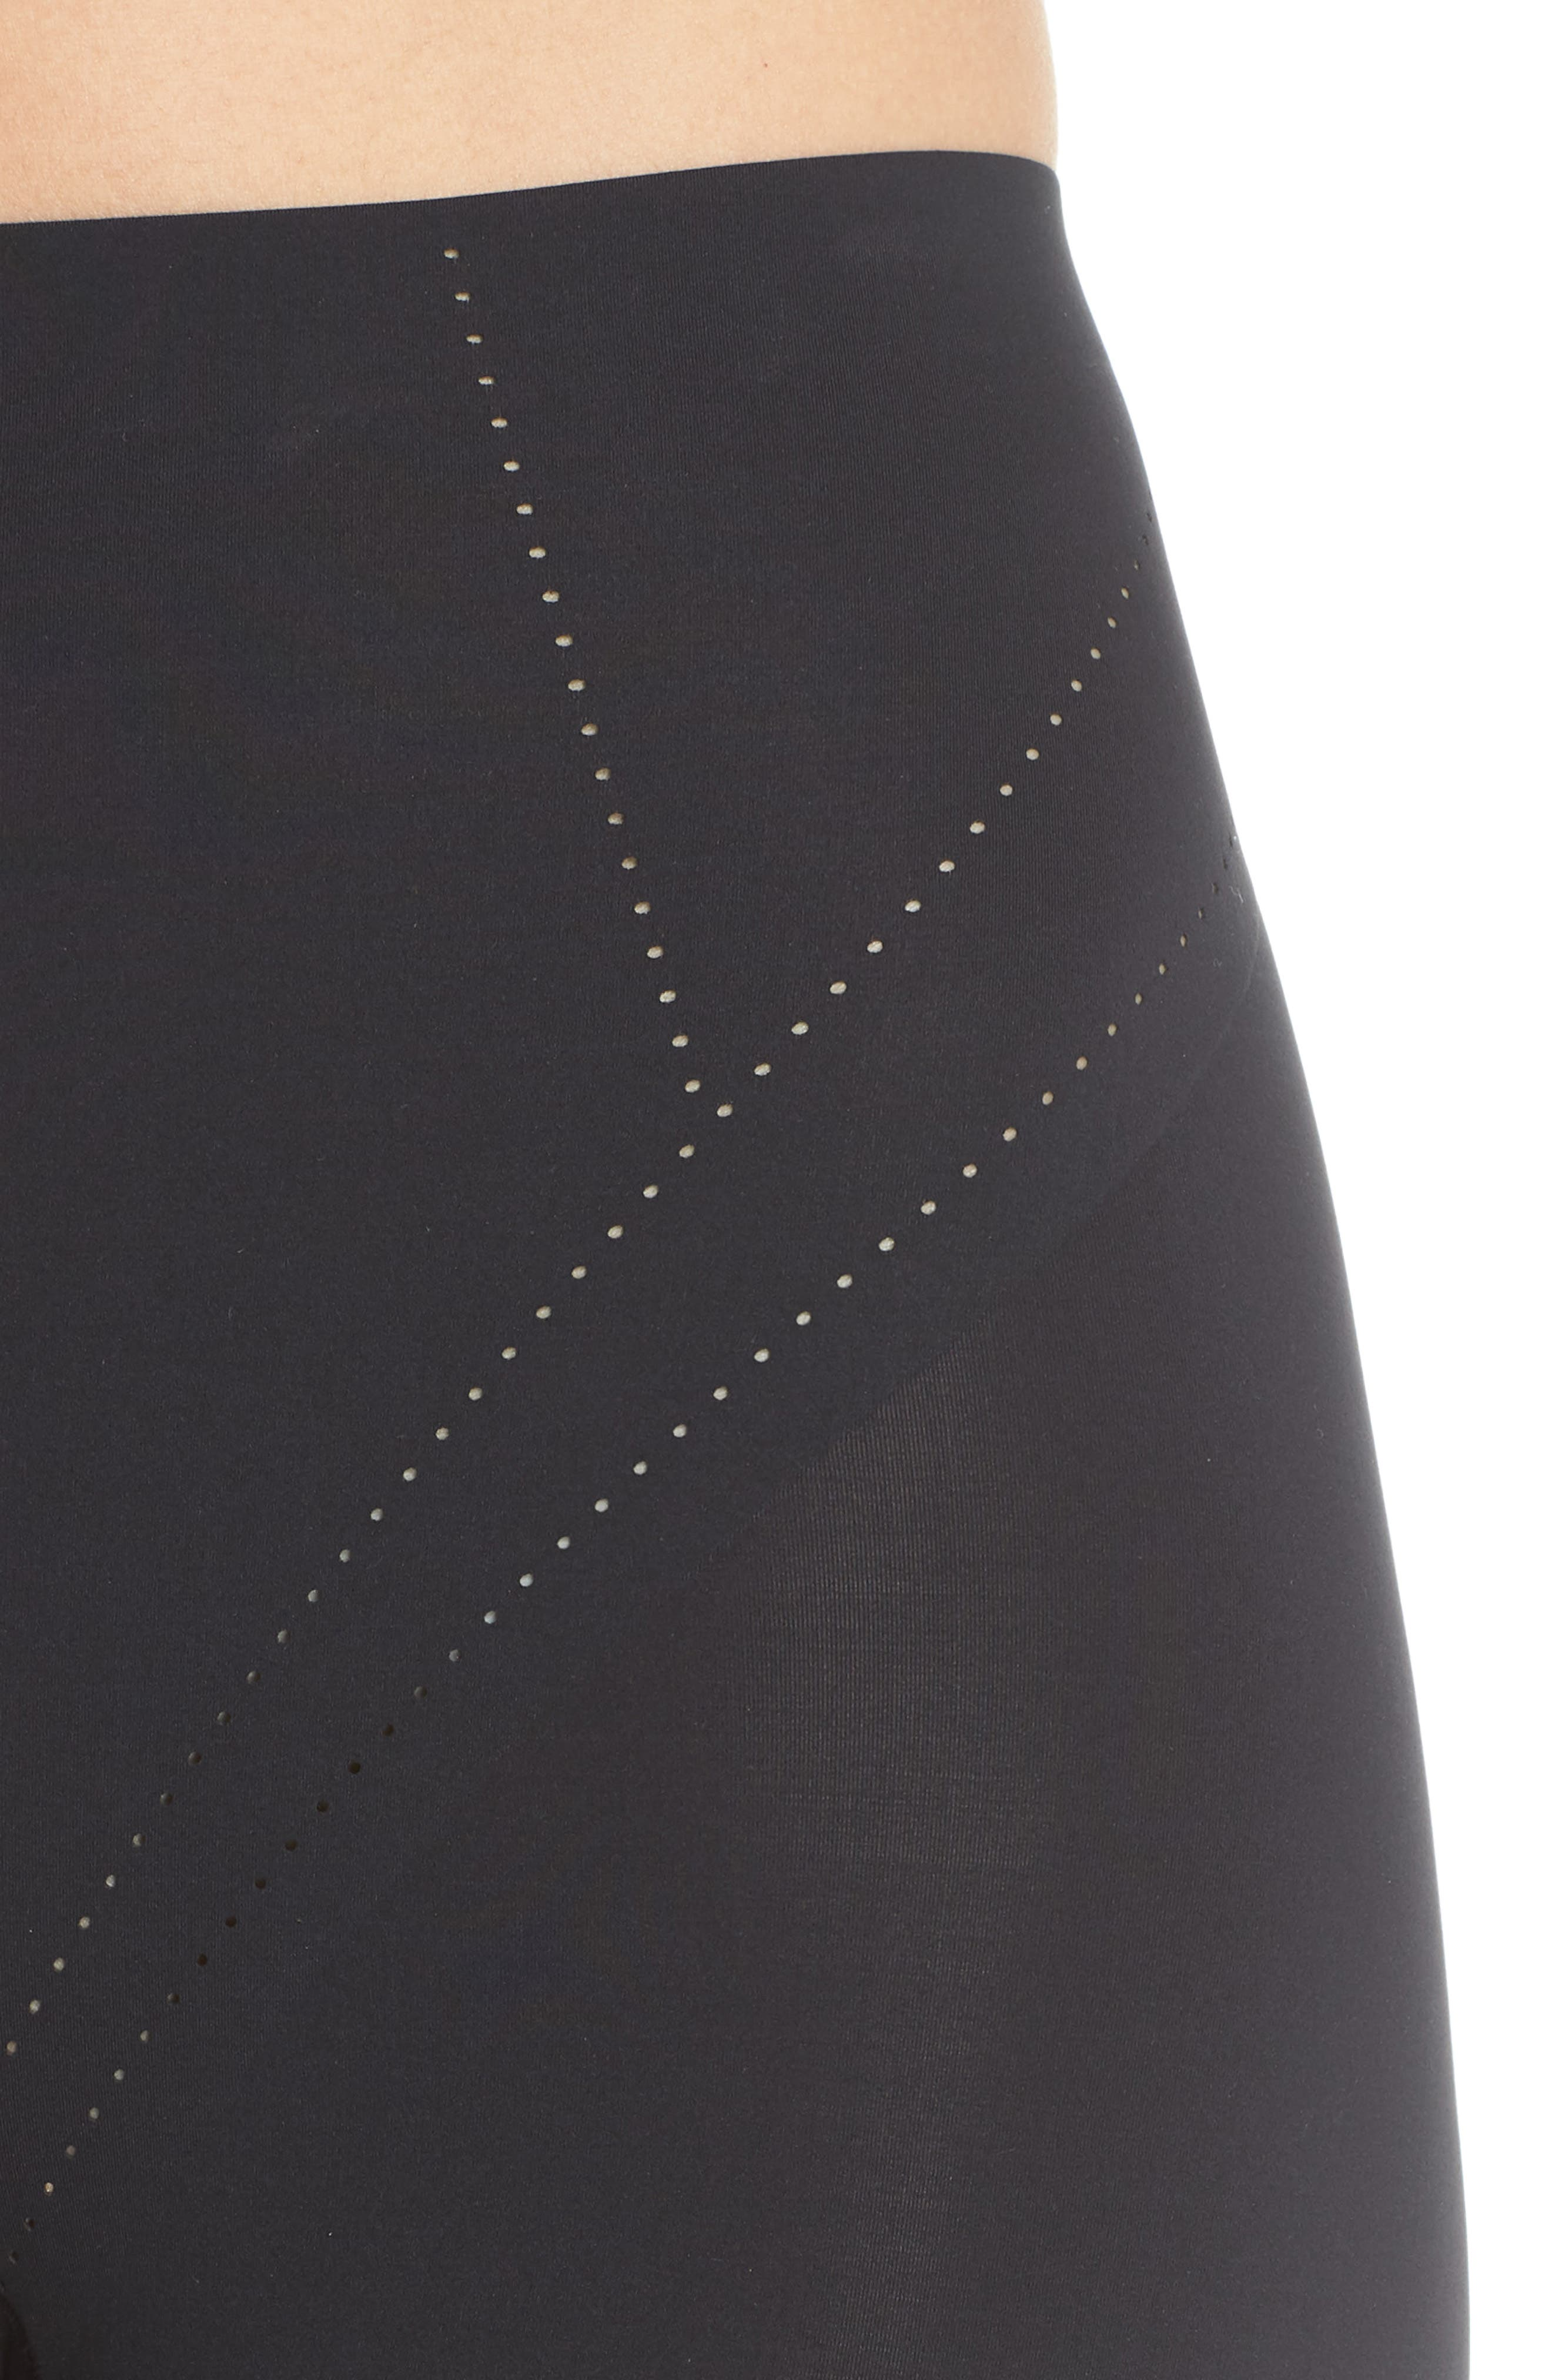 Shape Air Shaper Shorts,                             Alternate thumbnail 5, color,                             Black